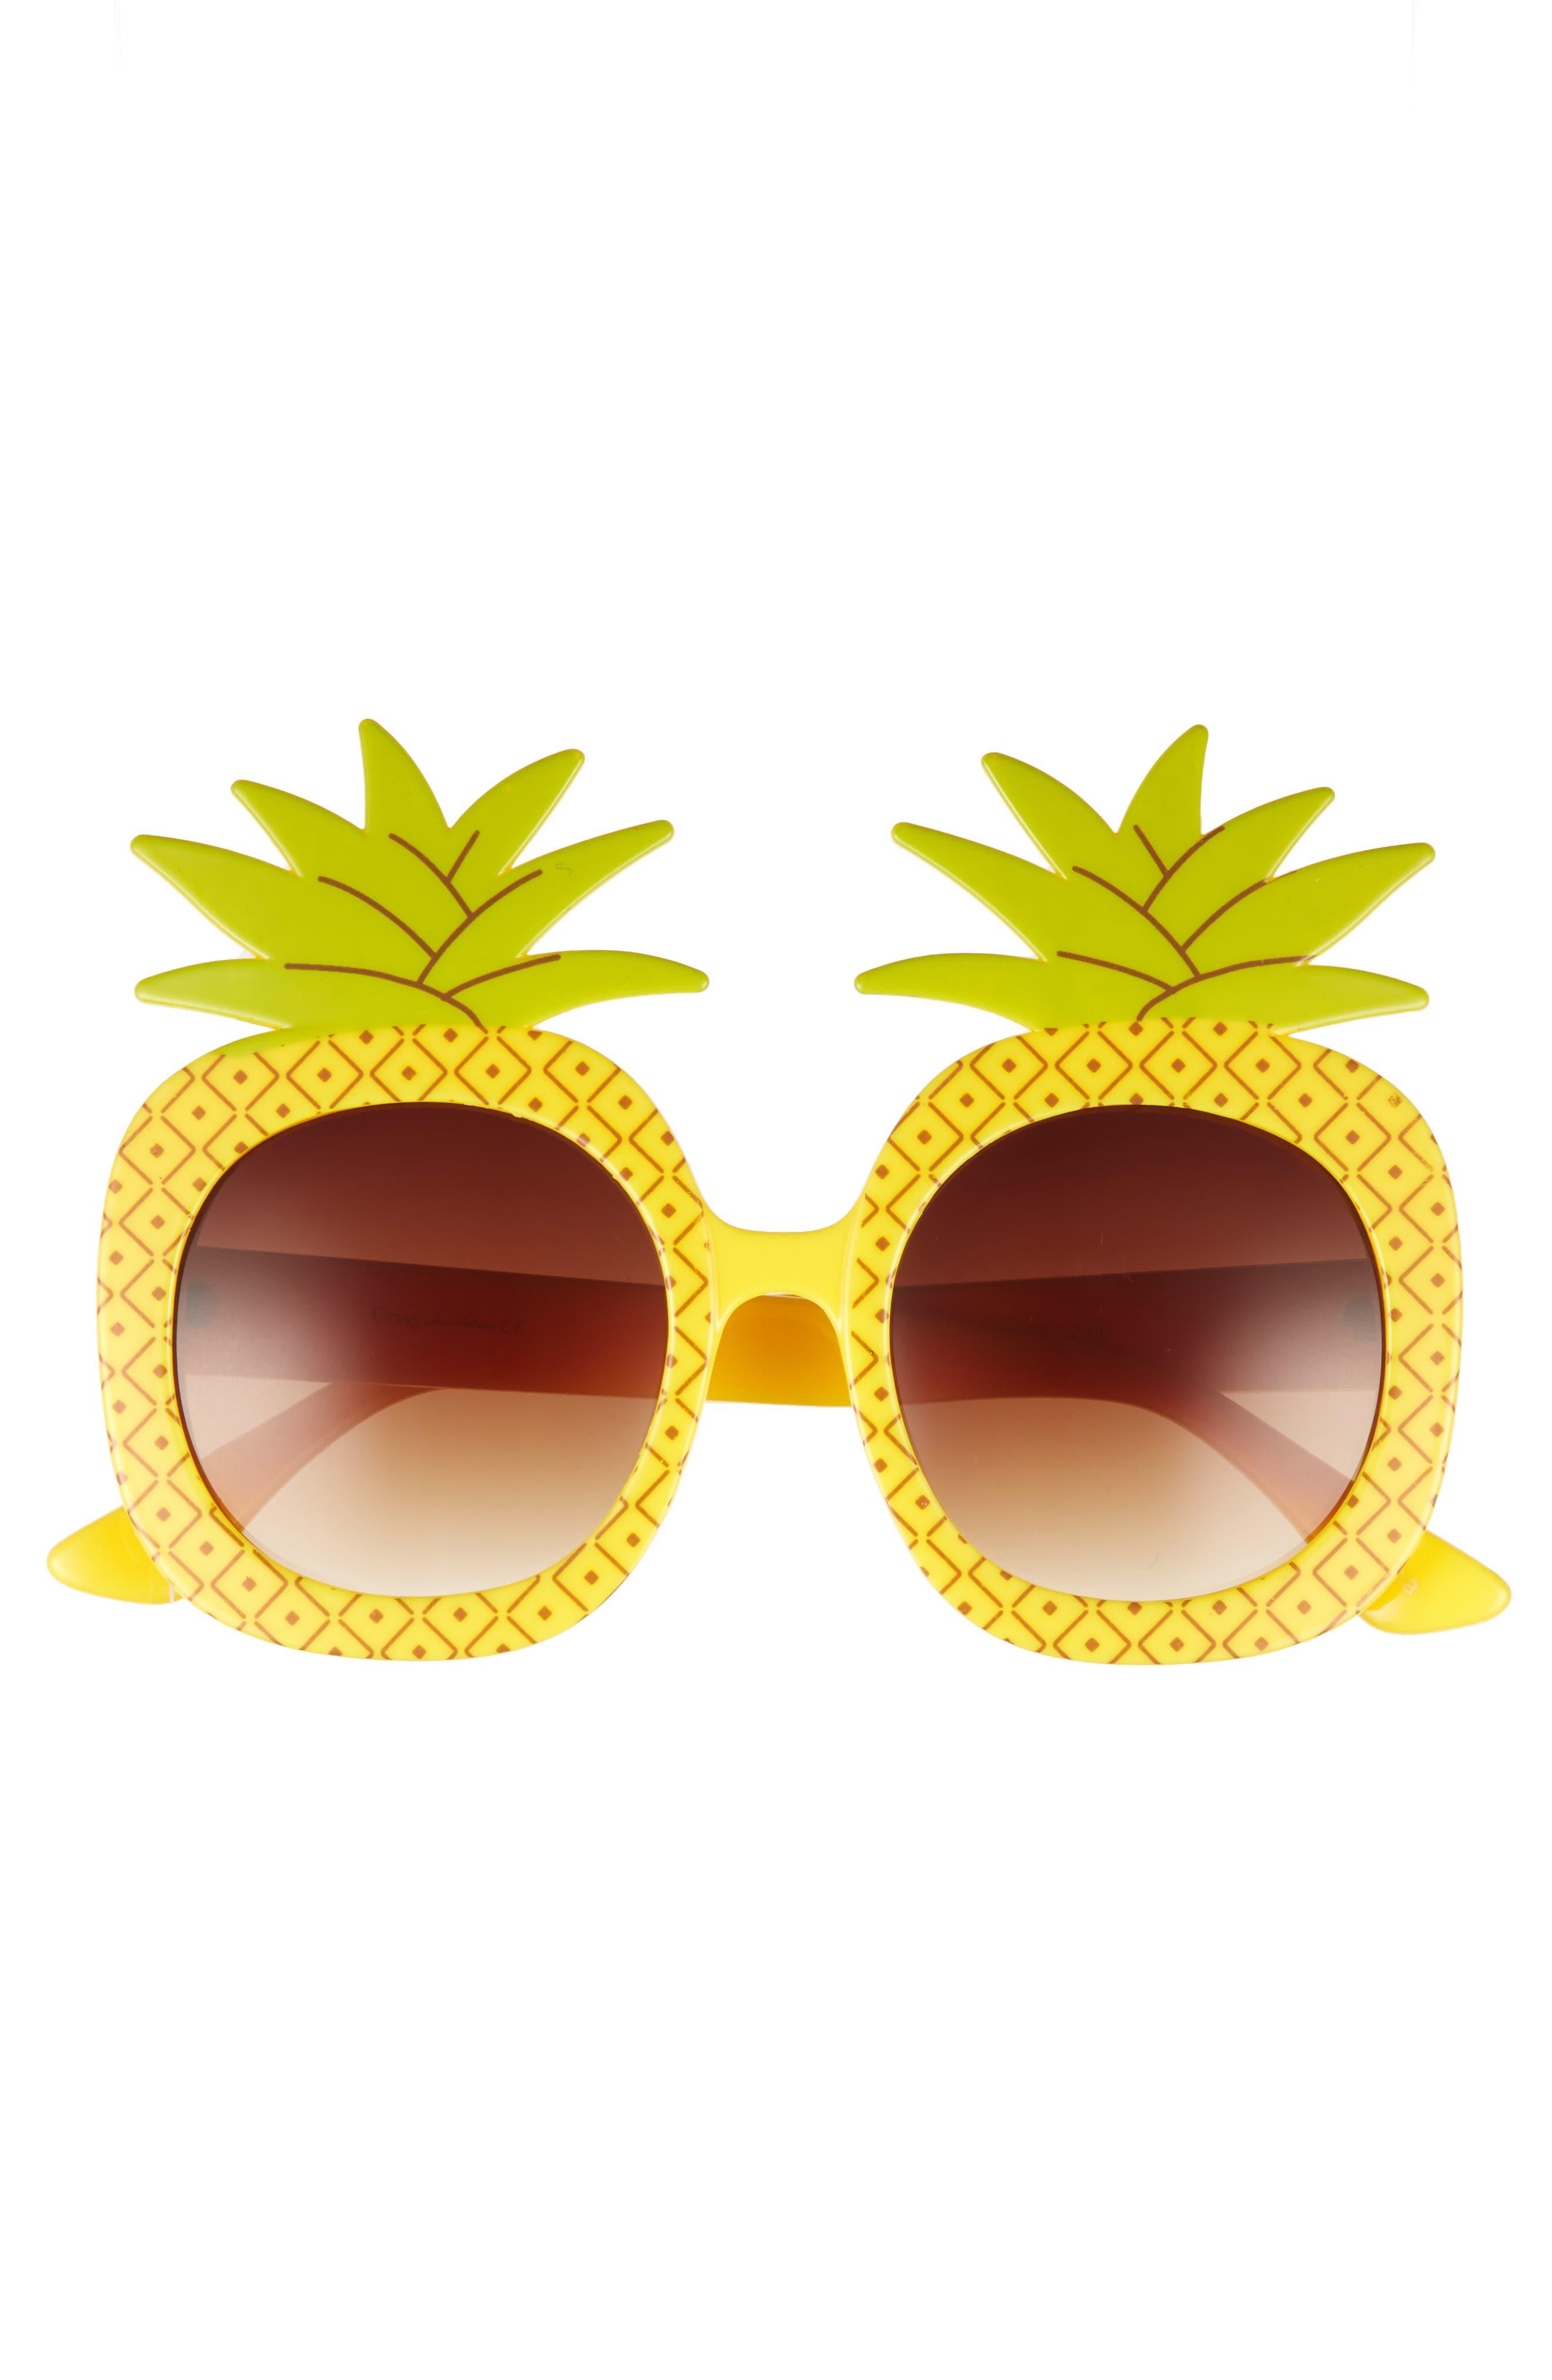 51mm Pineapple Glam Sunglasses,                             Alternate thumbnail 3, color,